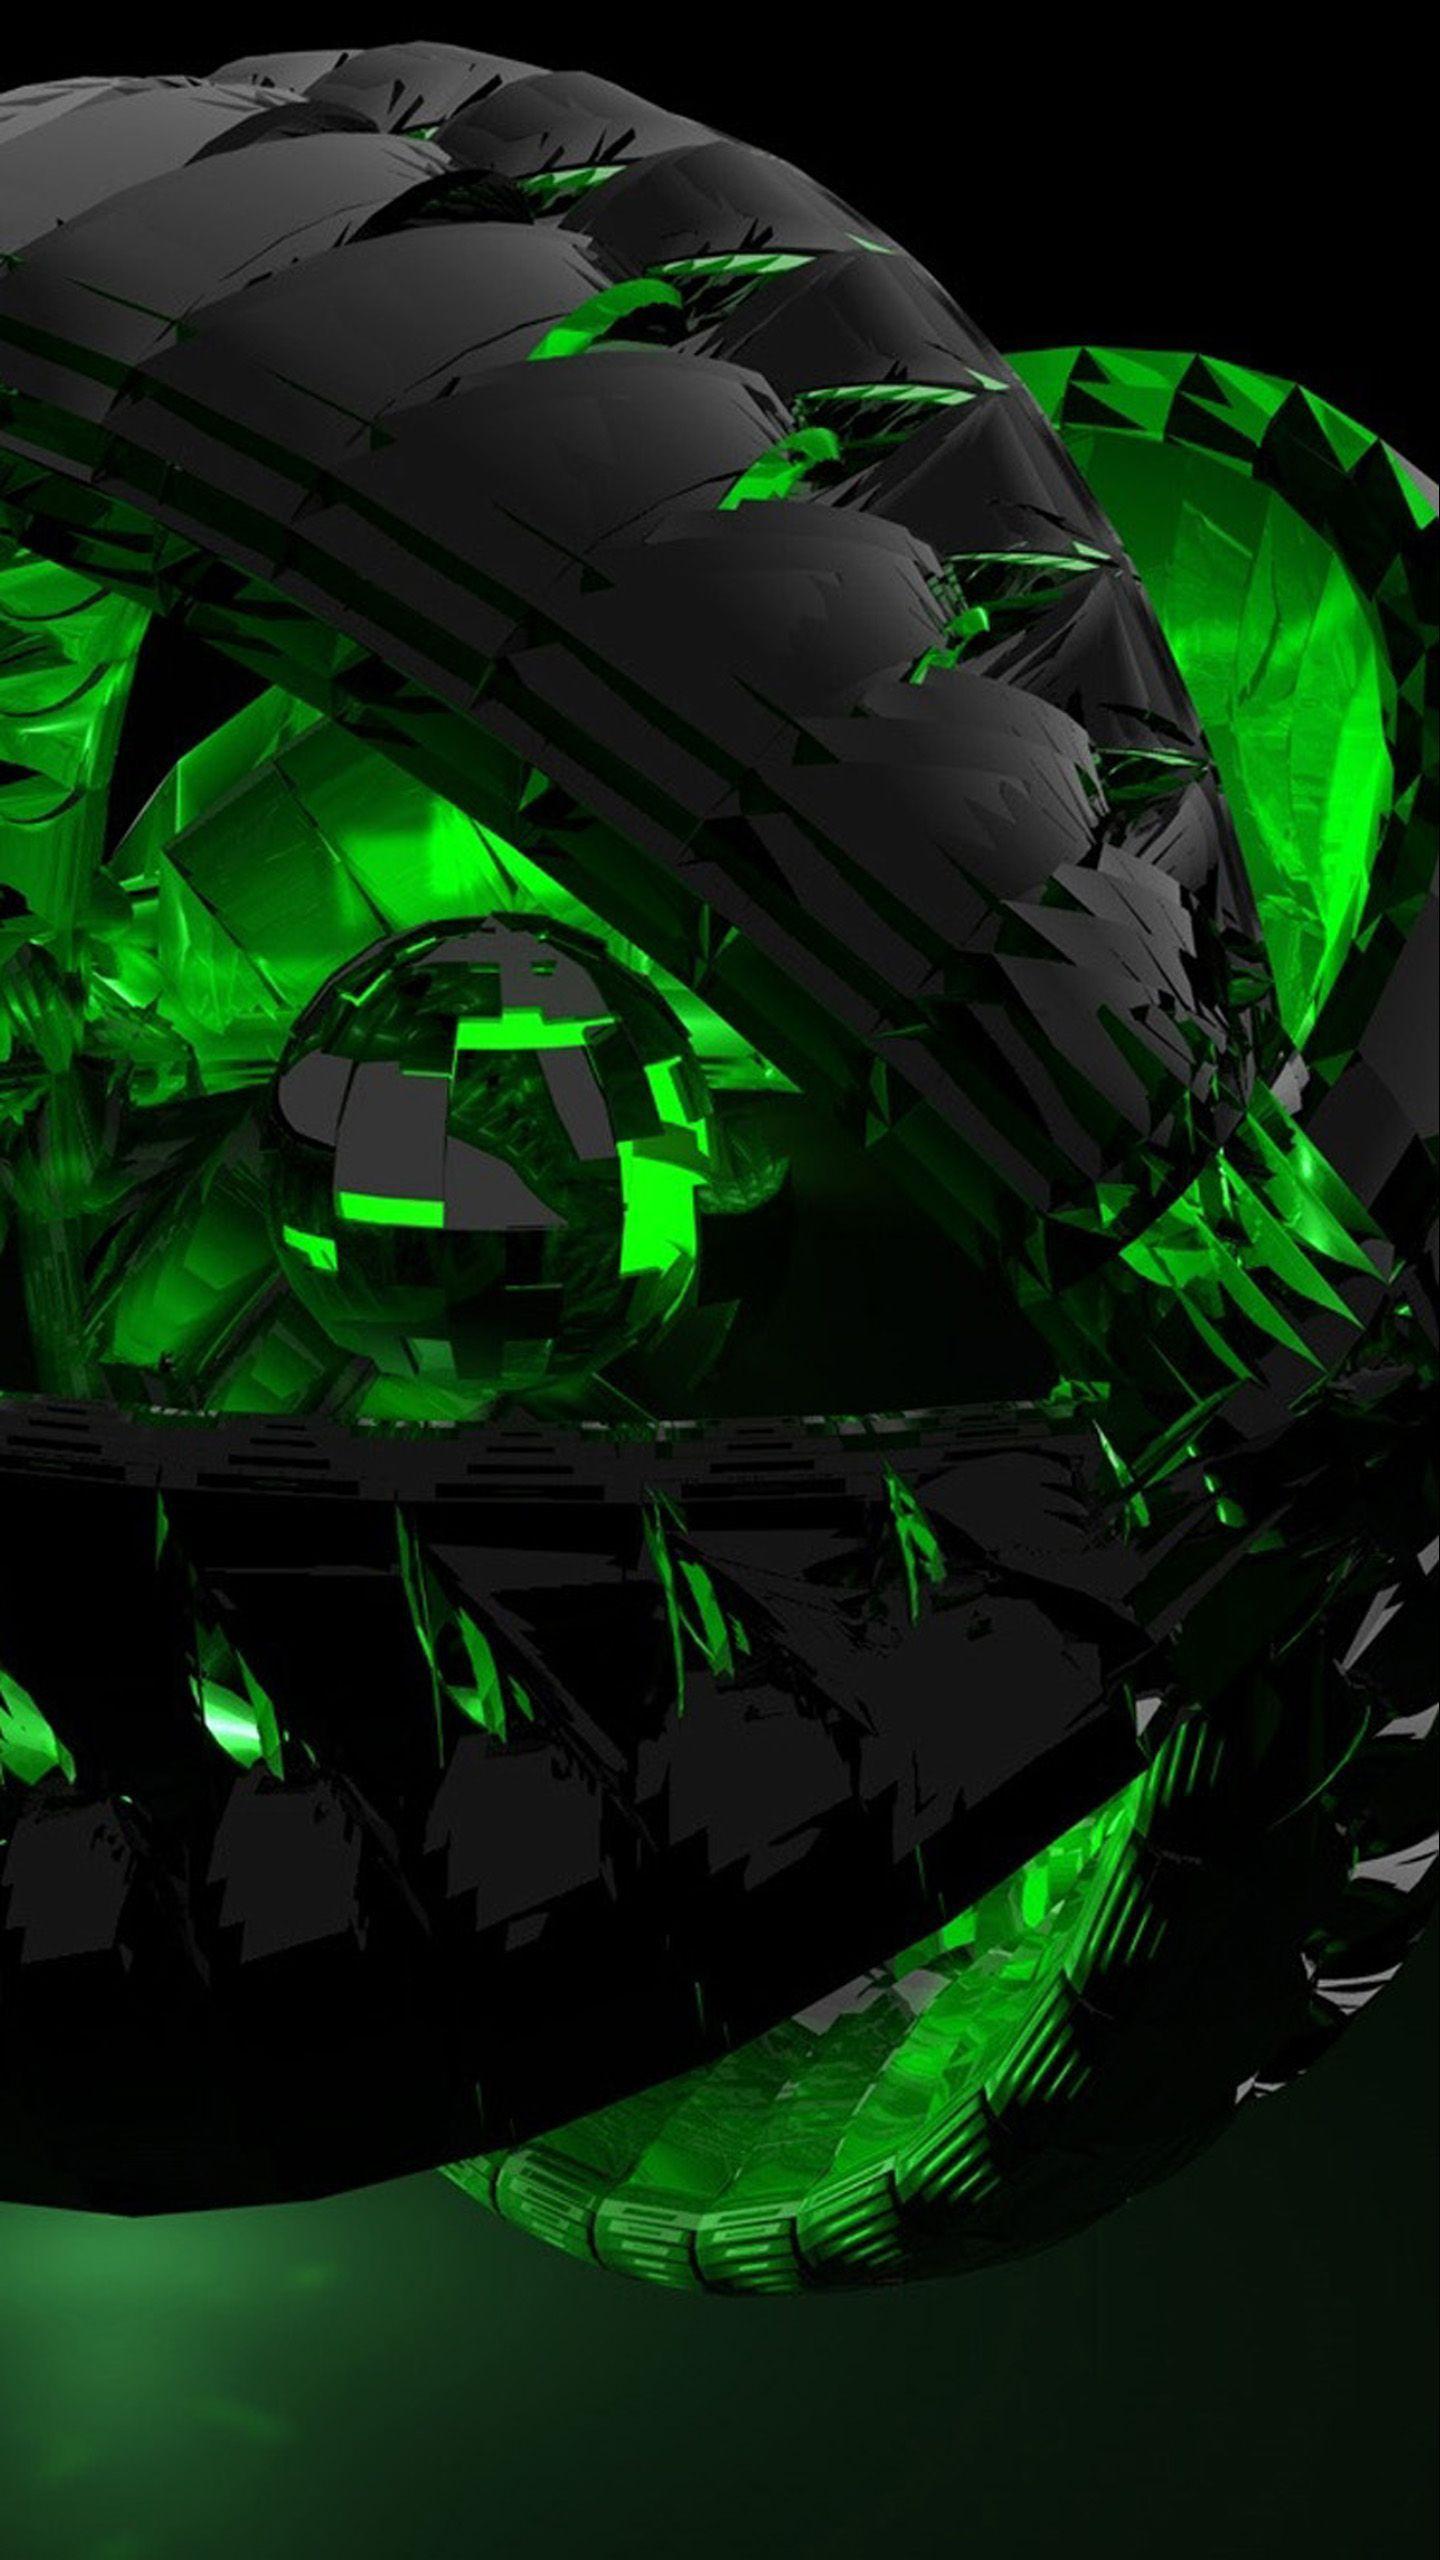 Green Galaxy Wallpapers - Top Free Green Galaxy ...